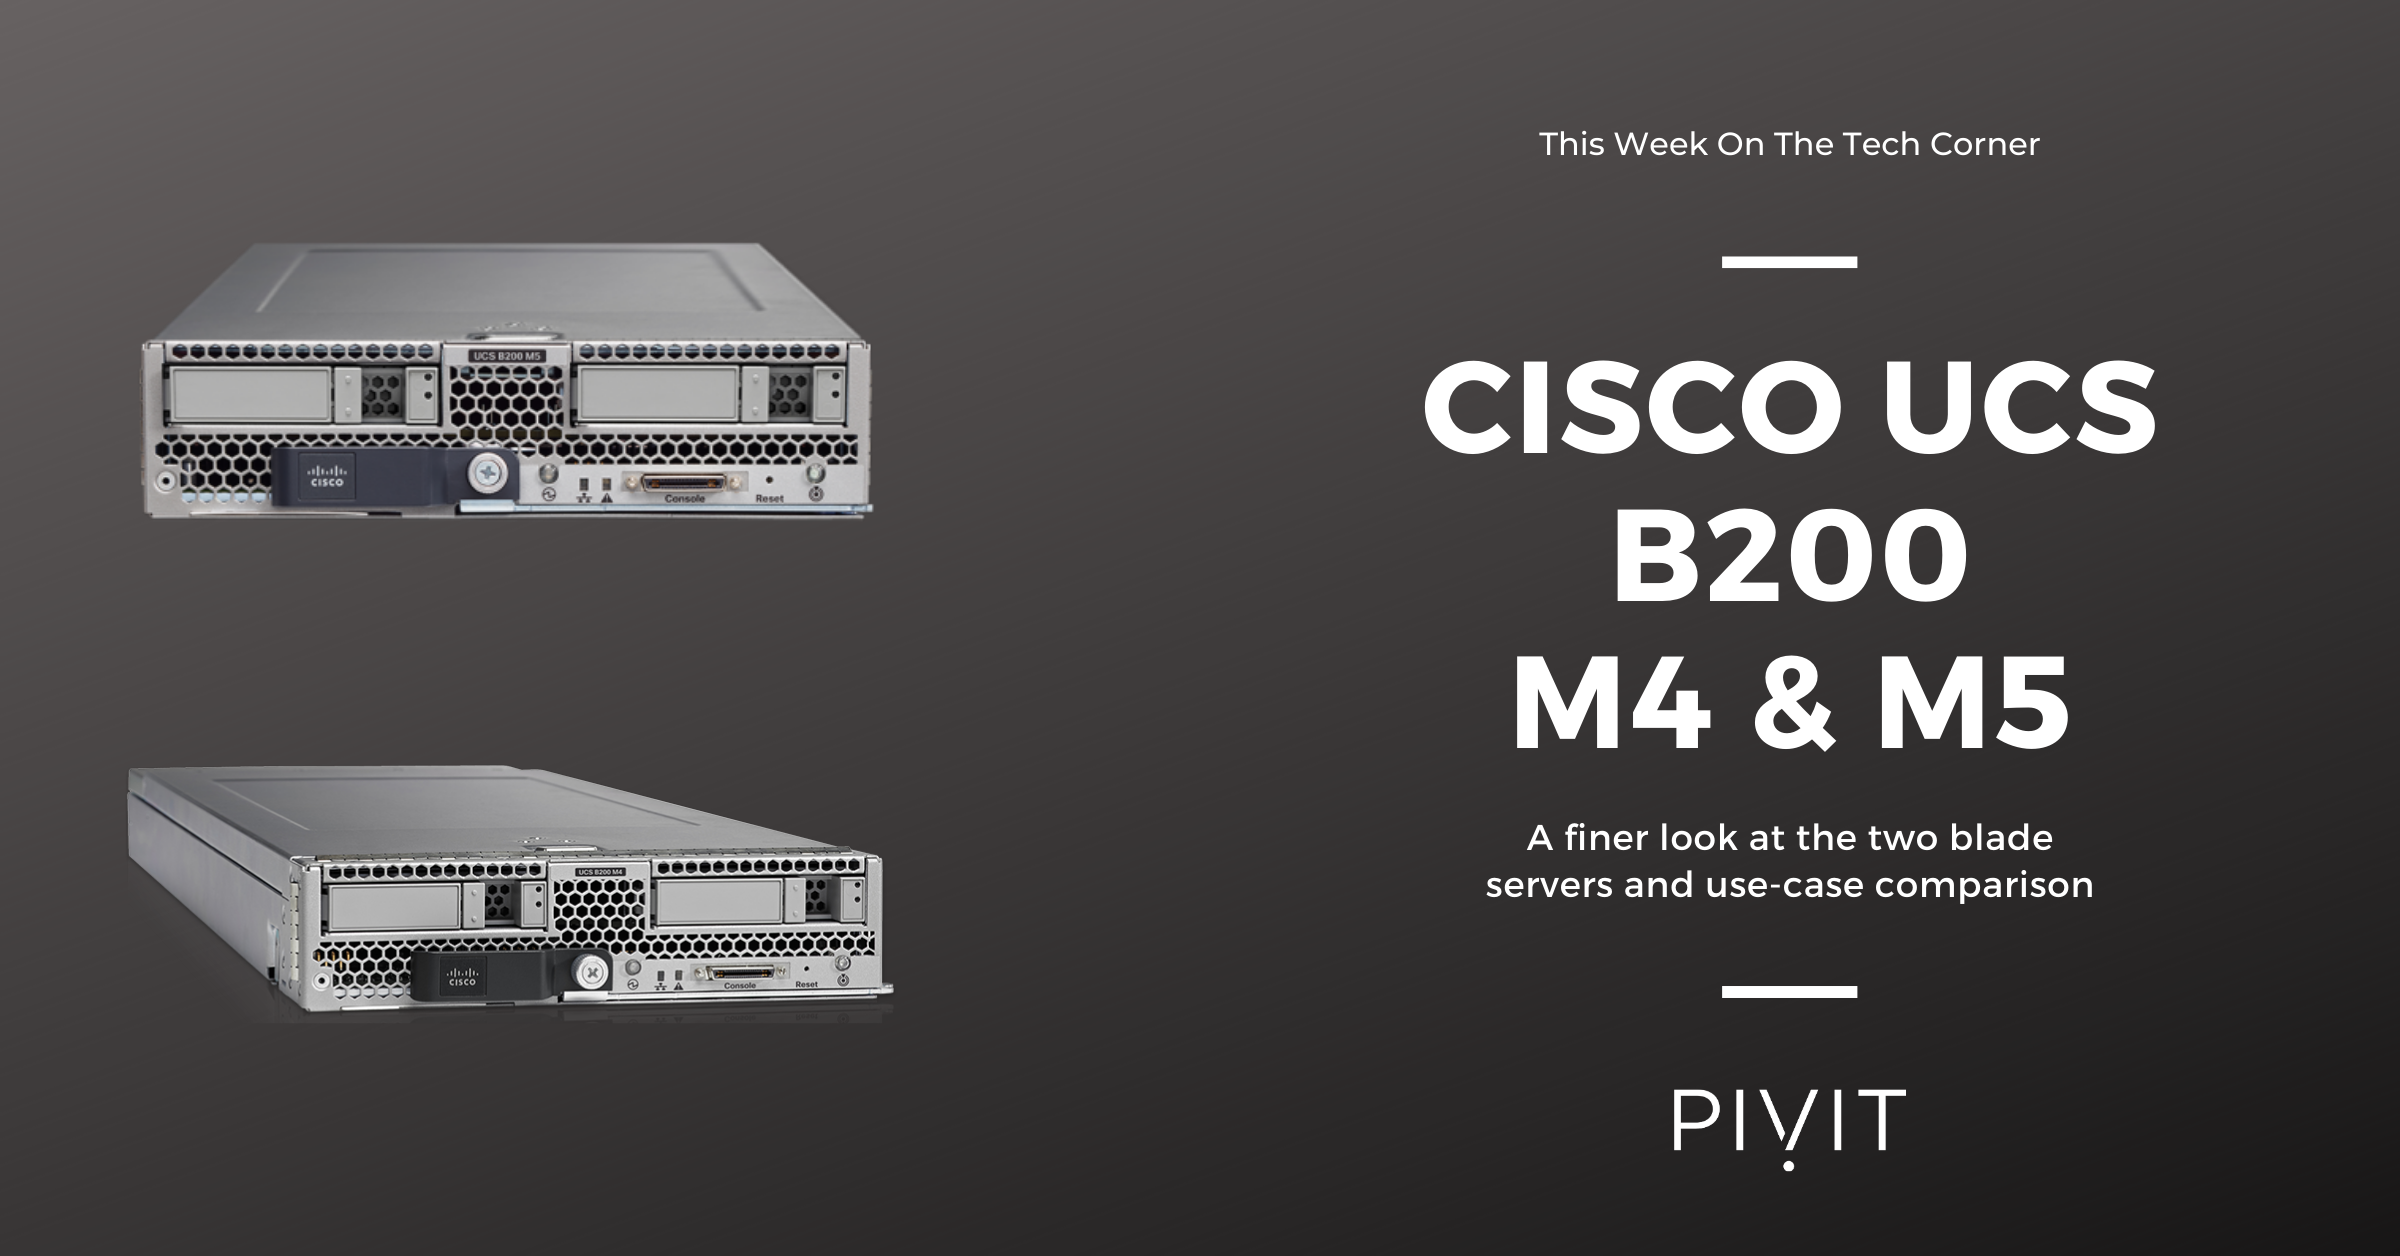 Comparison: Cisco UCS B200 M4 vs. Cisco UCS B200 M5